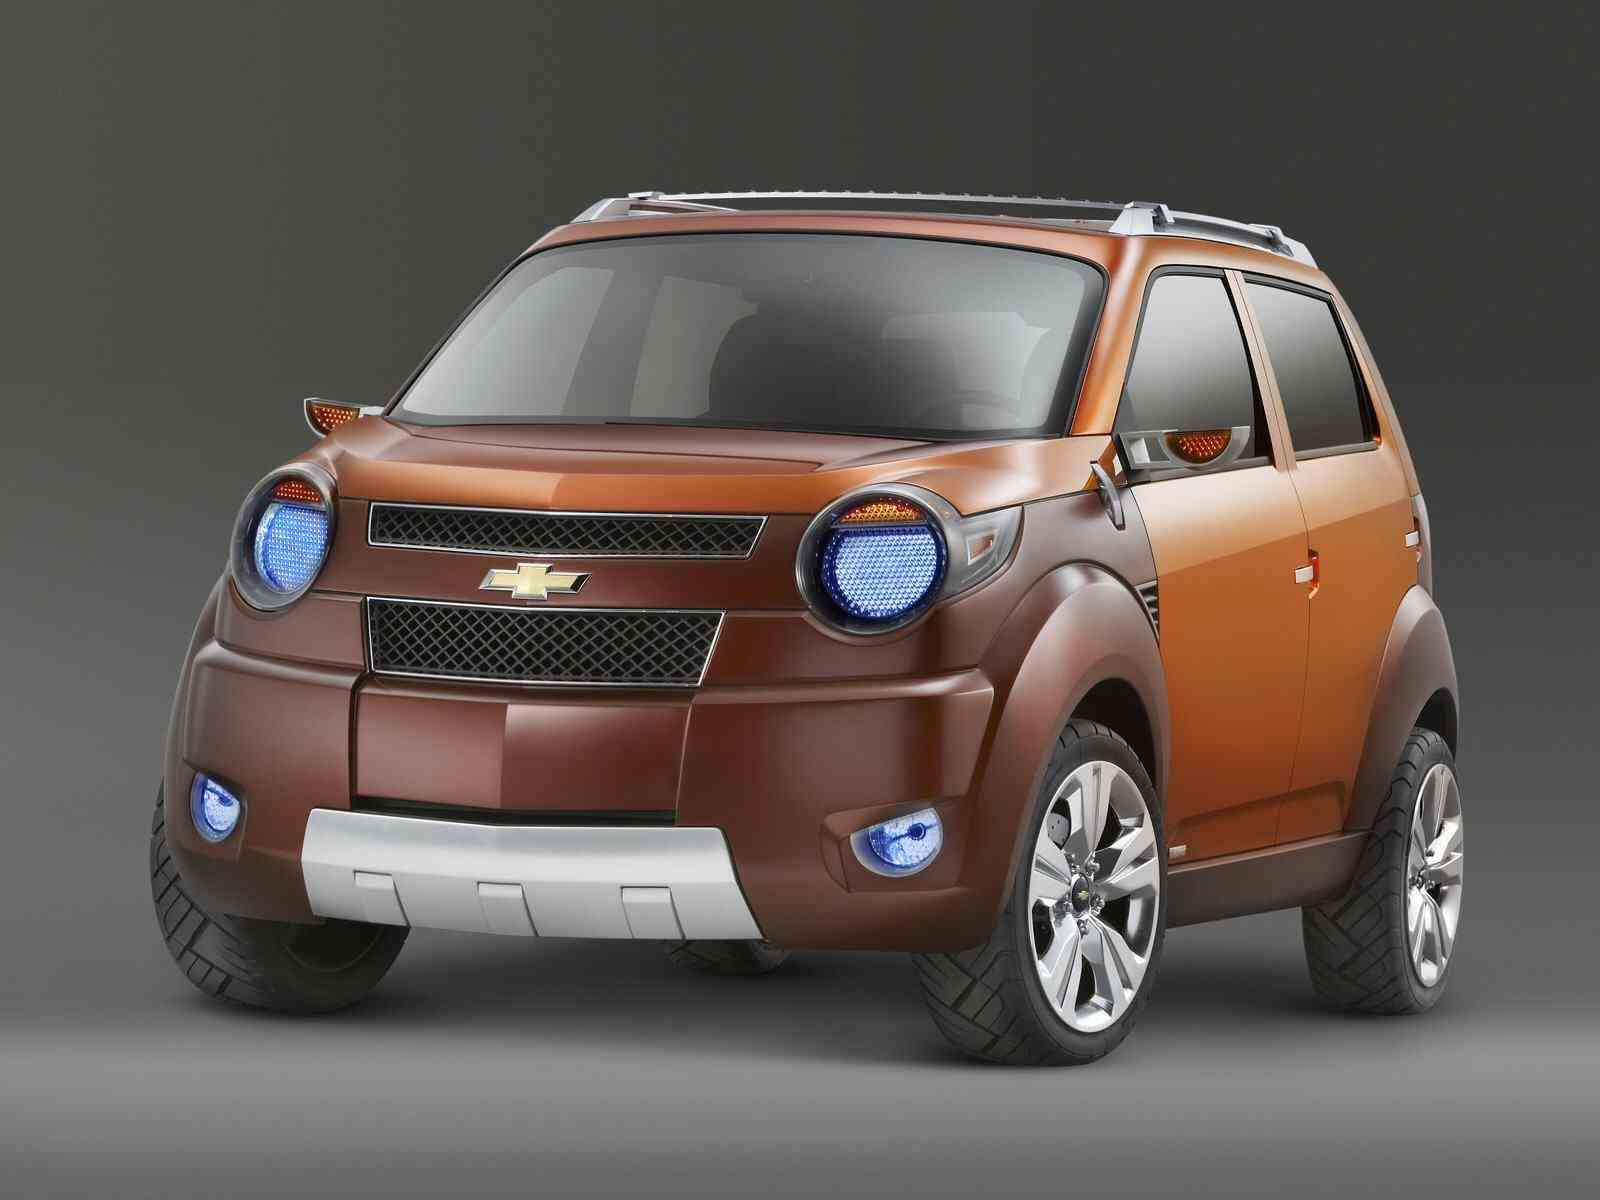 Chevrolet-Trax-Concept-front-three-quarters-studio-image